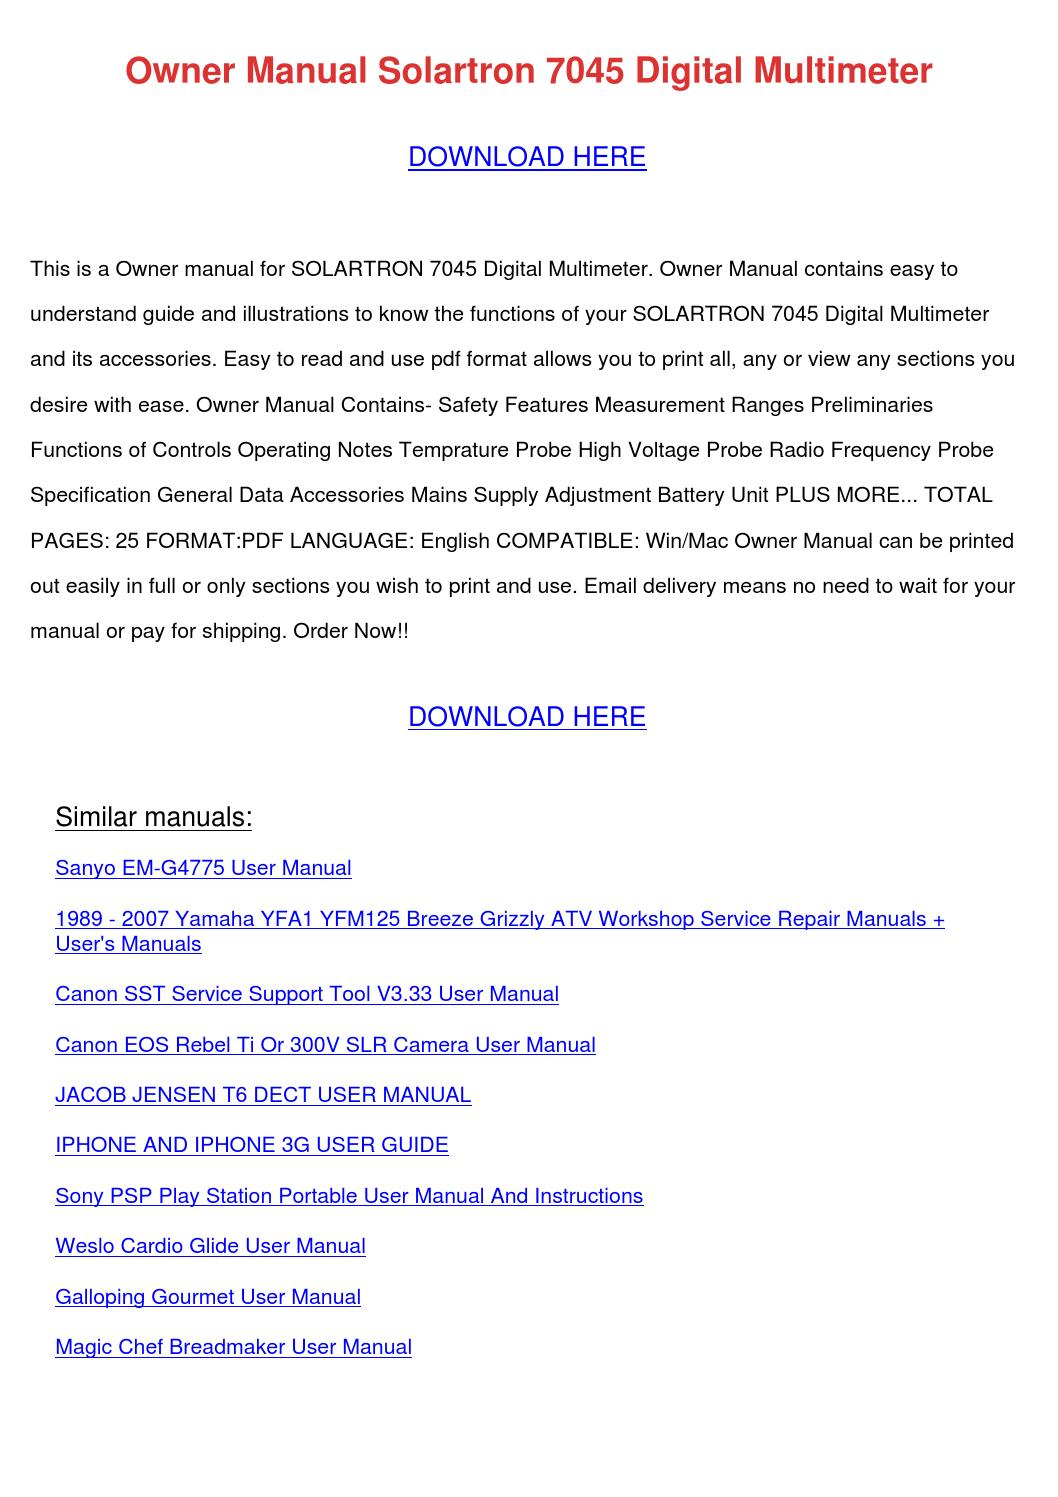 Owner Manual Solartron 7045 Digital Multimete by RomaReeder - issuu